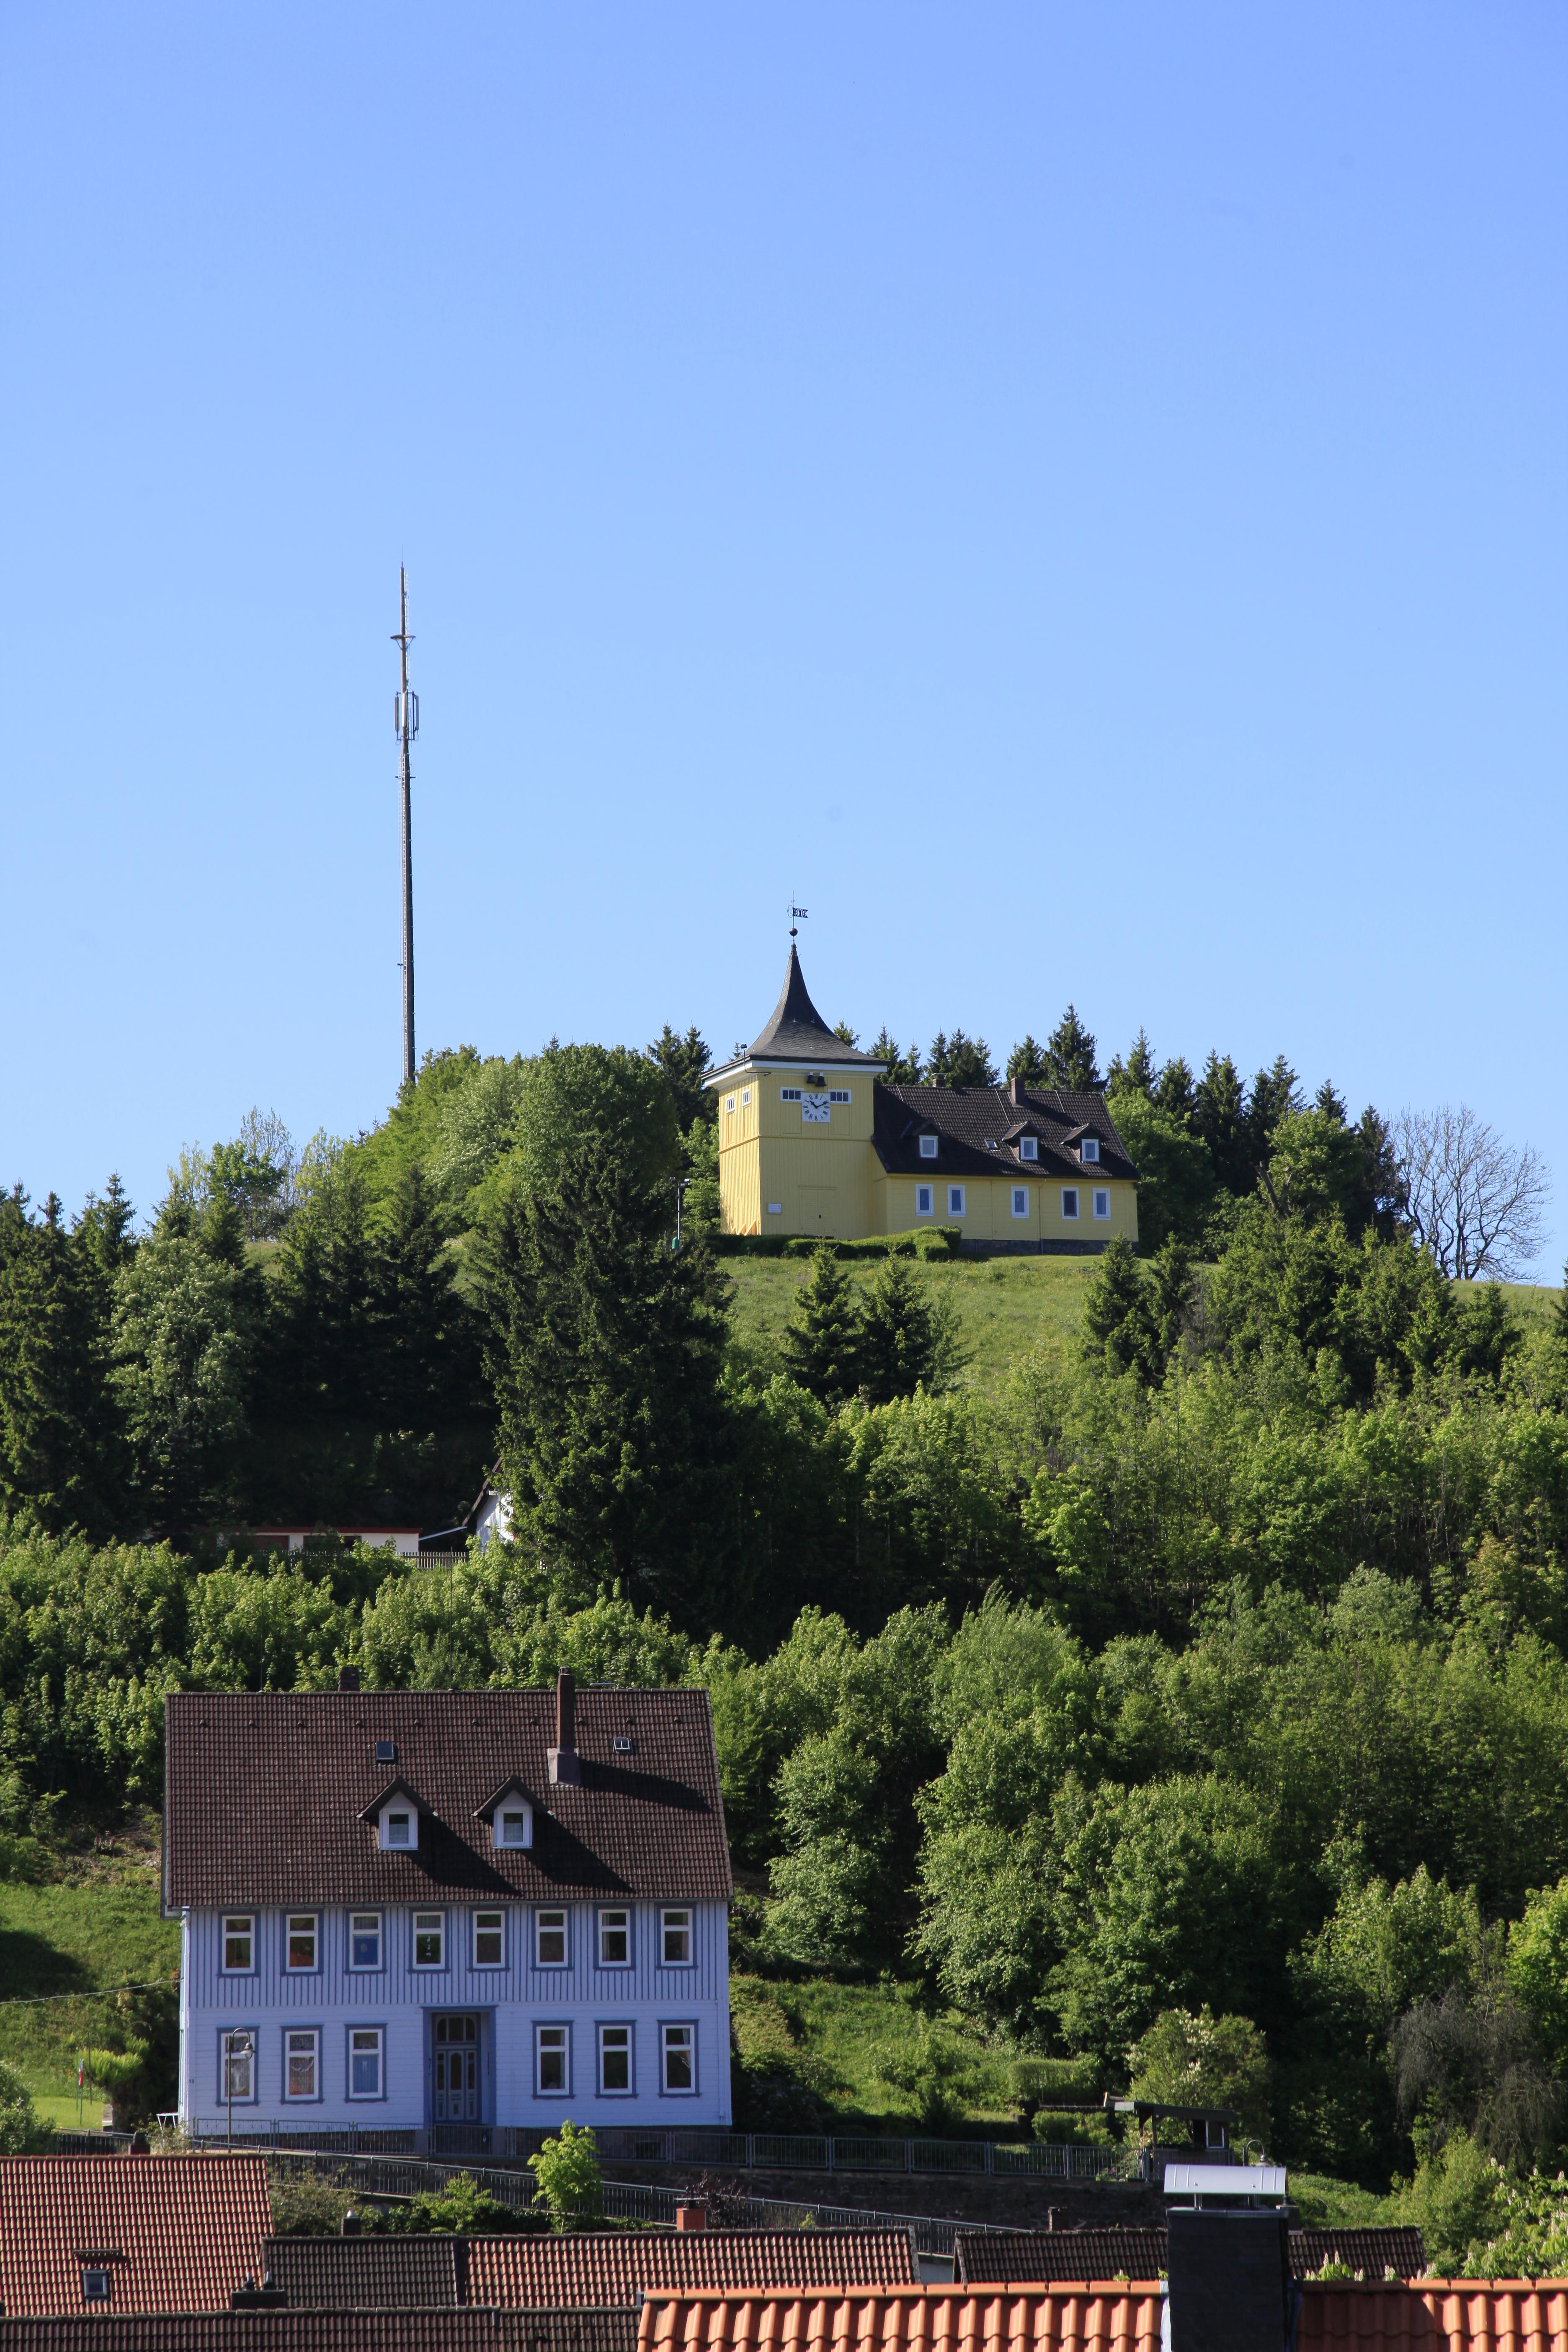 sankt-andreasberg-glockenturm2(c)siegfried-richter.JPG